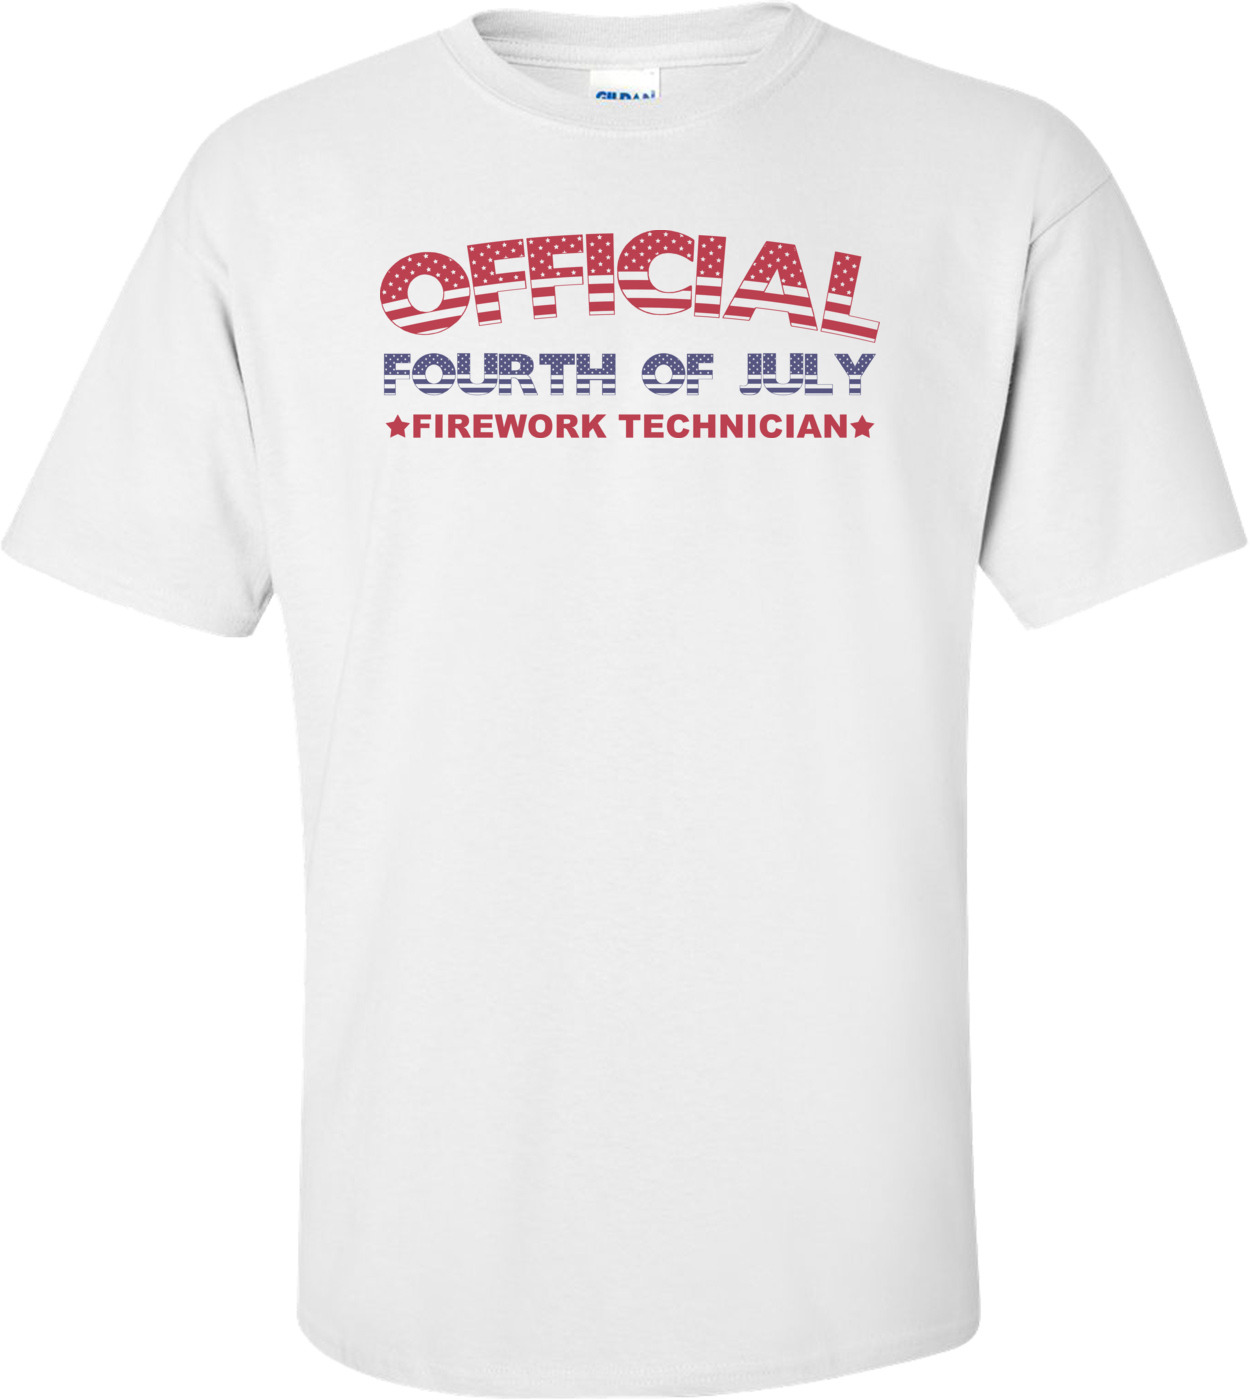 07d7defbf2b0 official-4th-of-july-firework-technician--fourth-of-july-tshirt-3p.jpg